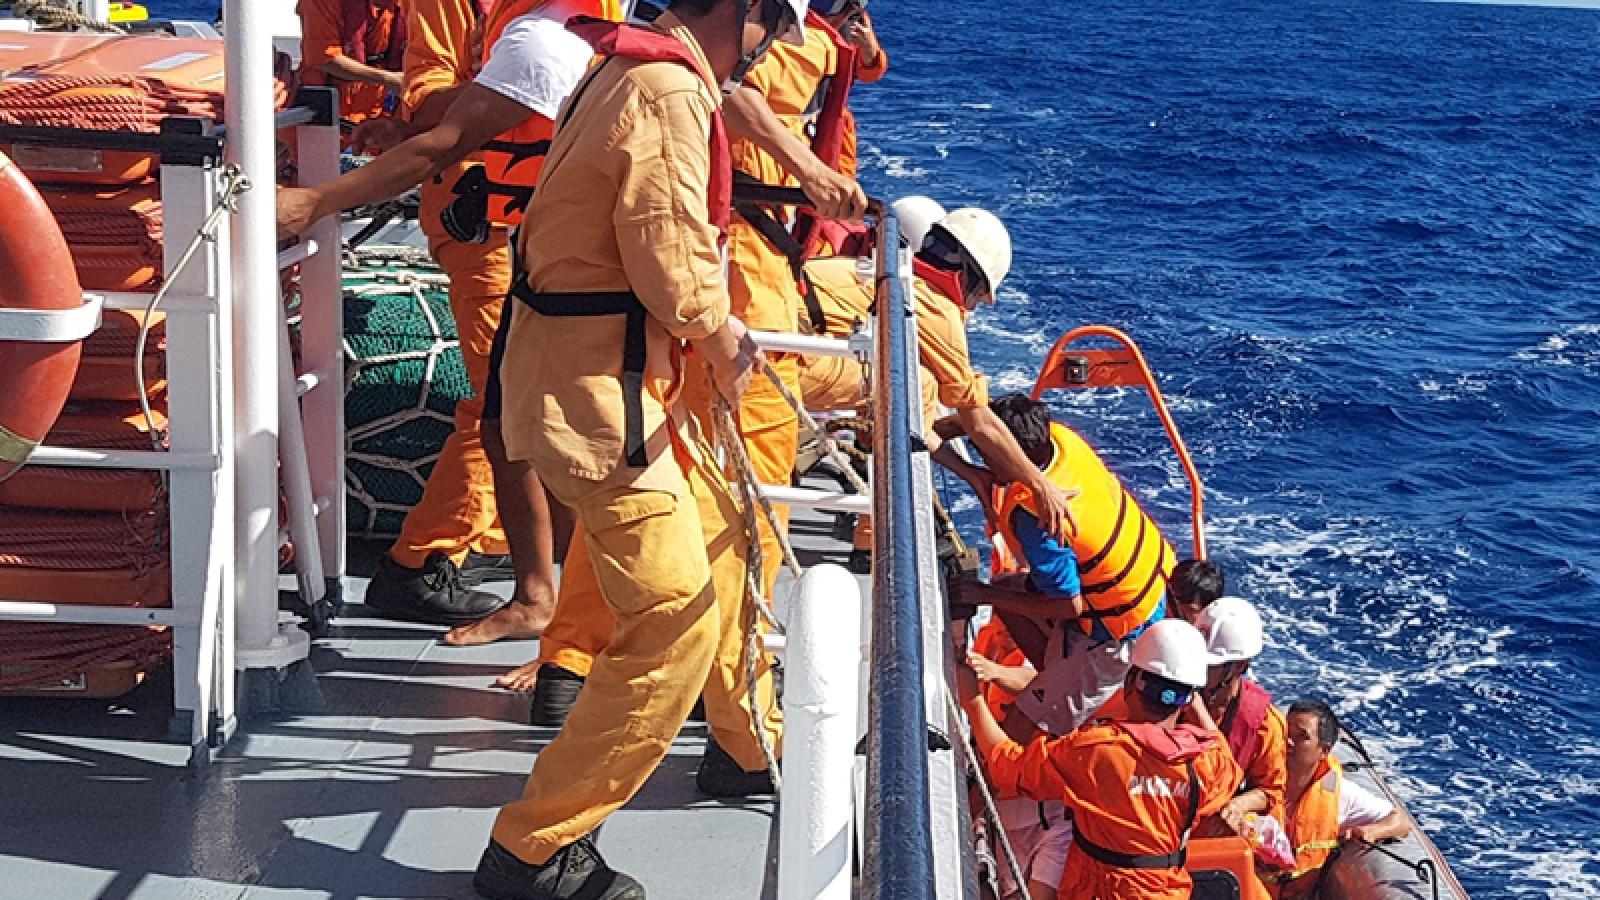 Six fishermen saved from sinking vessel near Hoang Sa archipelago